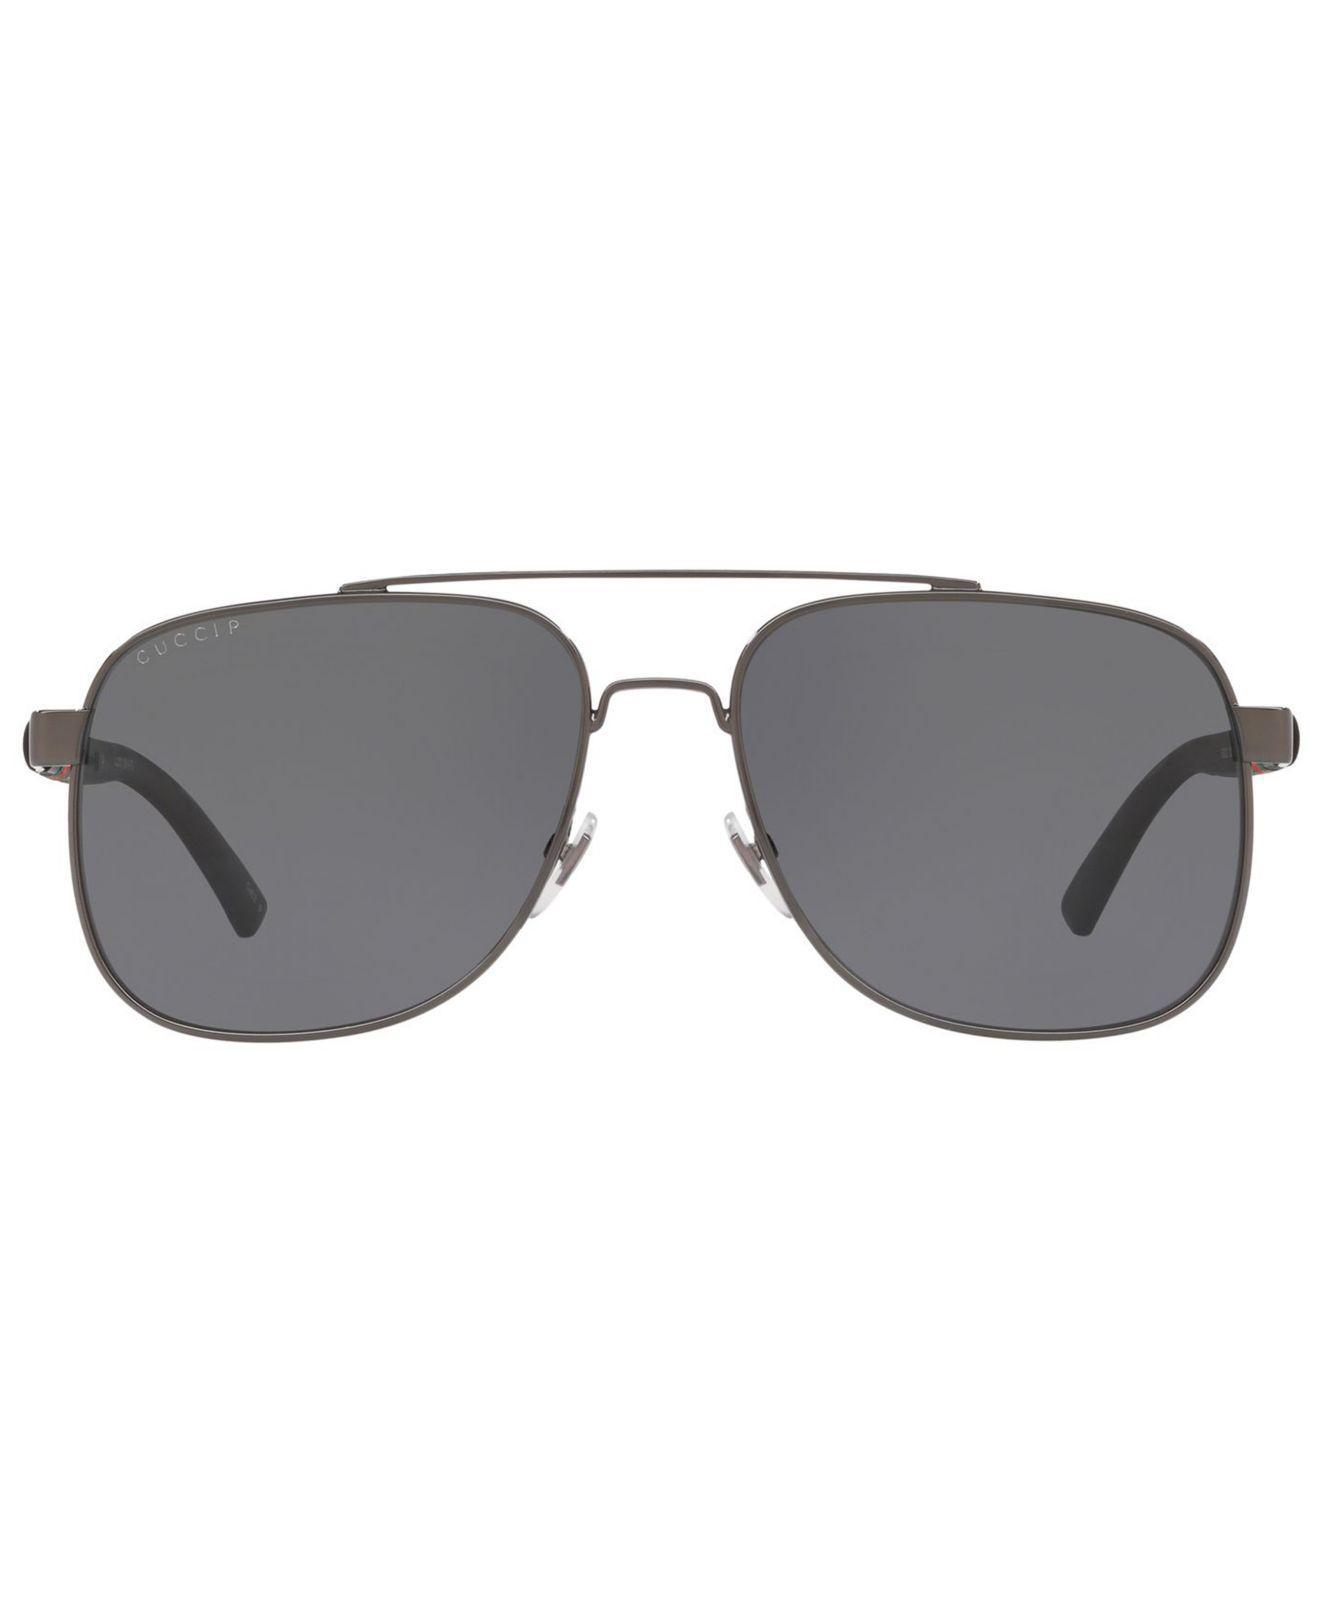 cff08a32a80 Lyst - Gucci Polarized Sunglasses